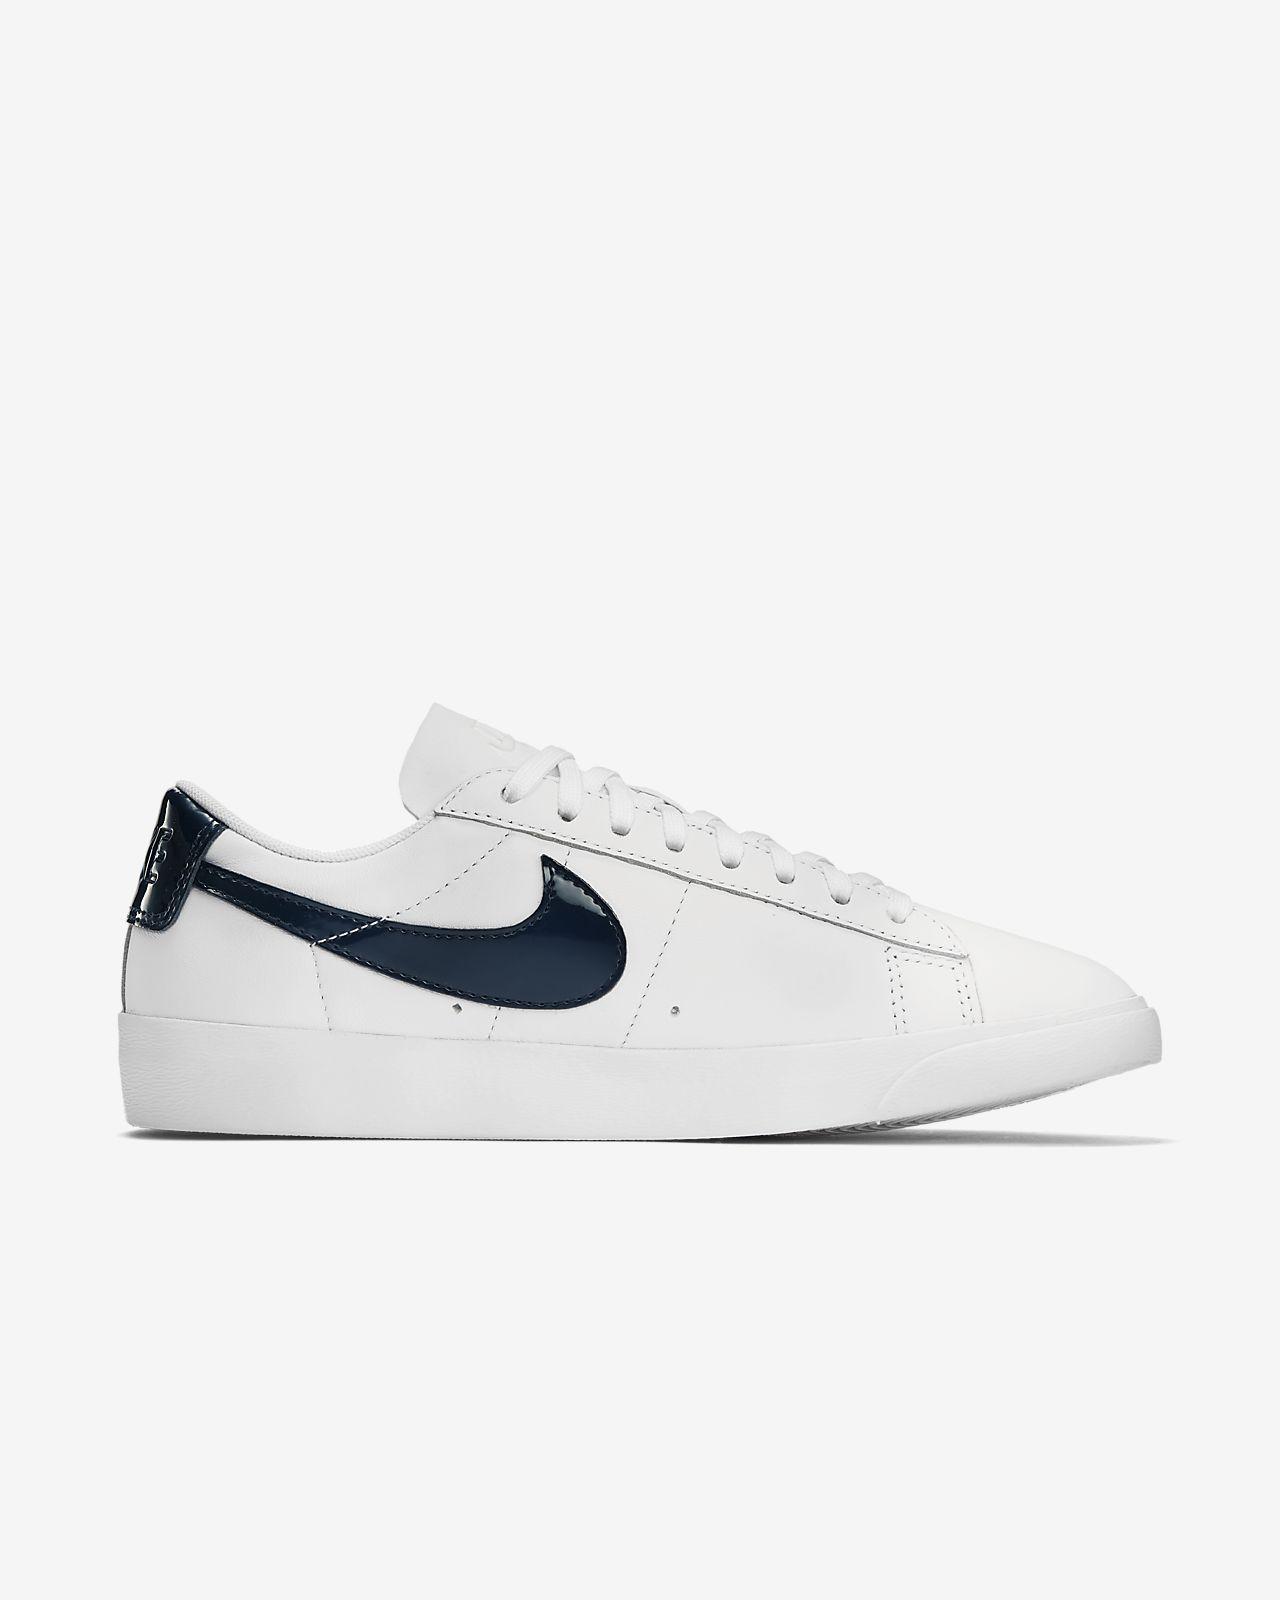 Donna Nike Blazer Taglia 2 ad Alta Top Scarpe Da Ginnastica